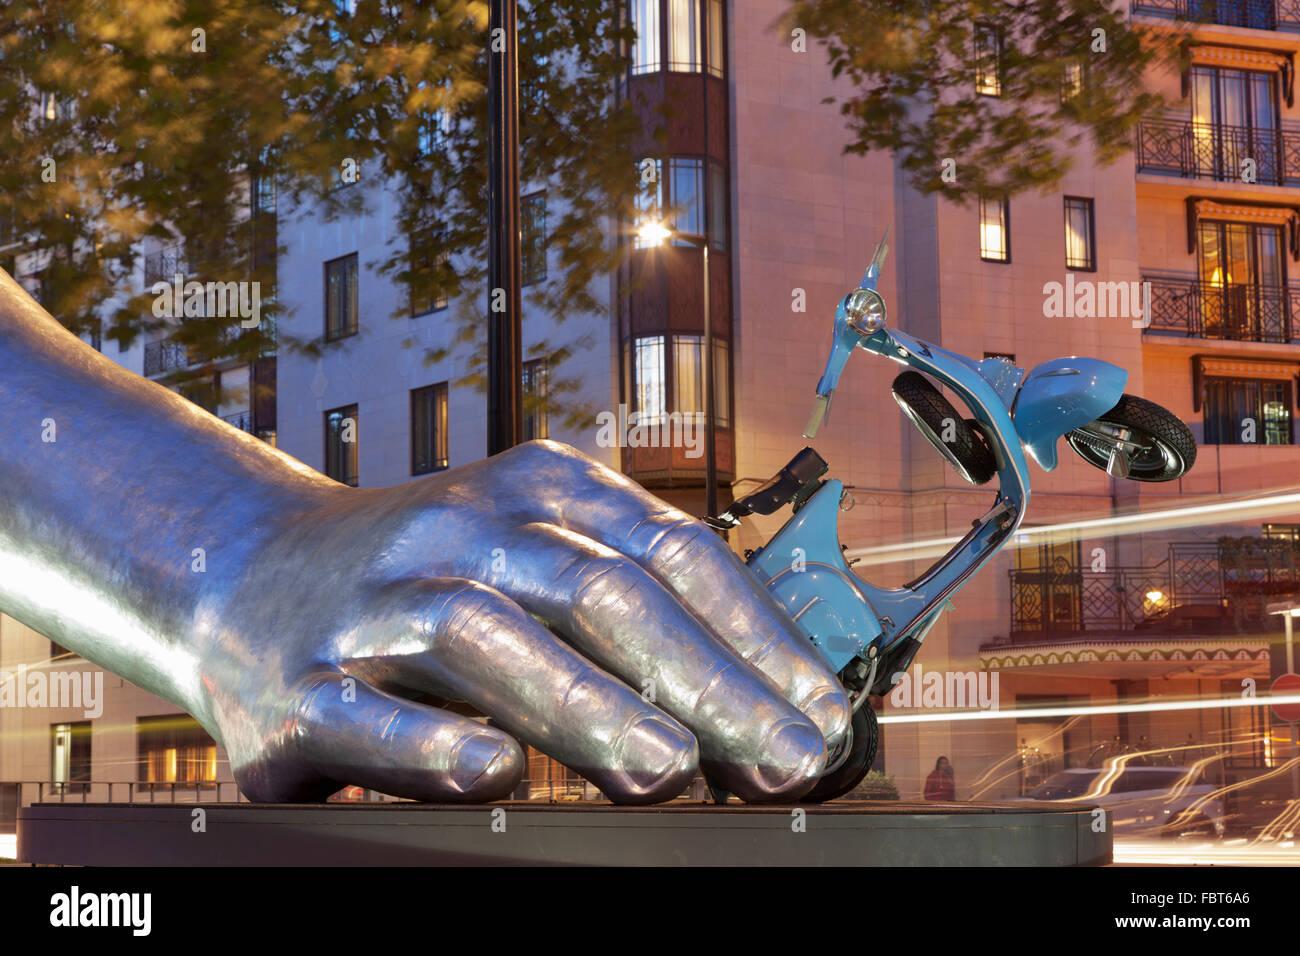 La Dolce Vita sculpture on Park Lane by Lorenzo Quinn - Stock Image